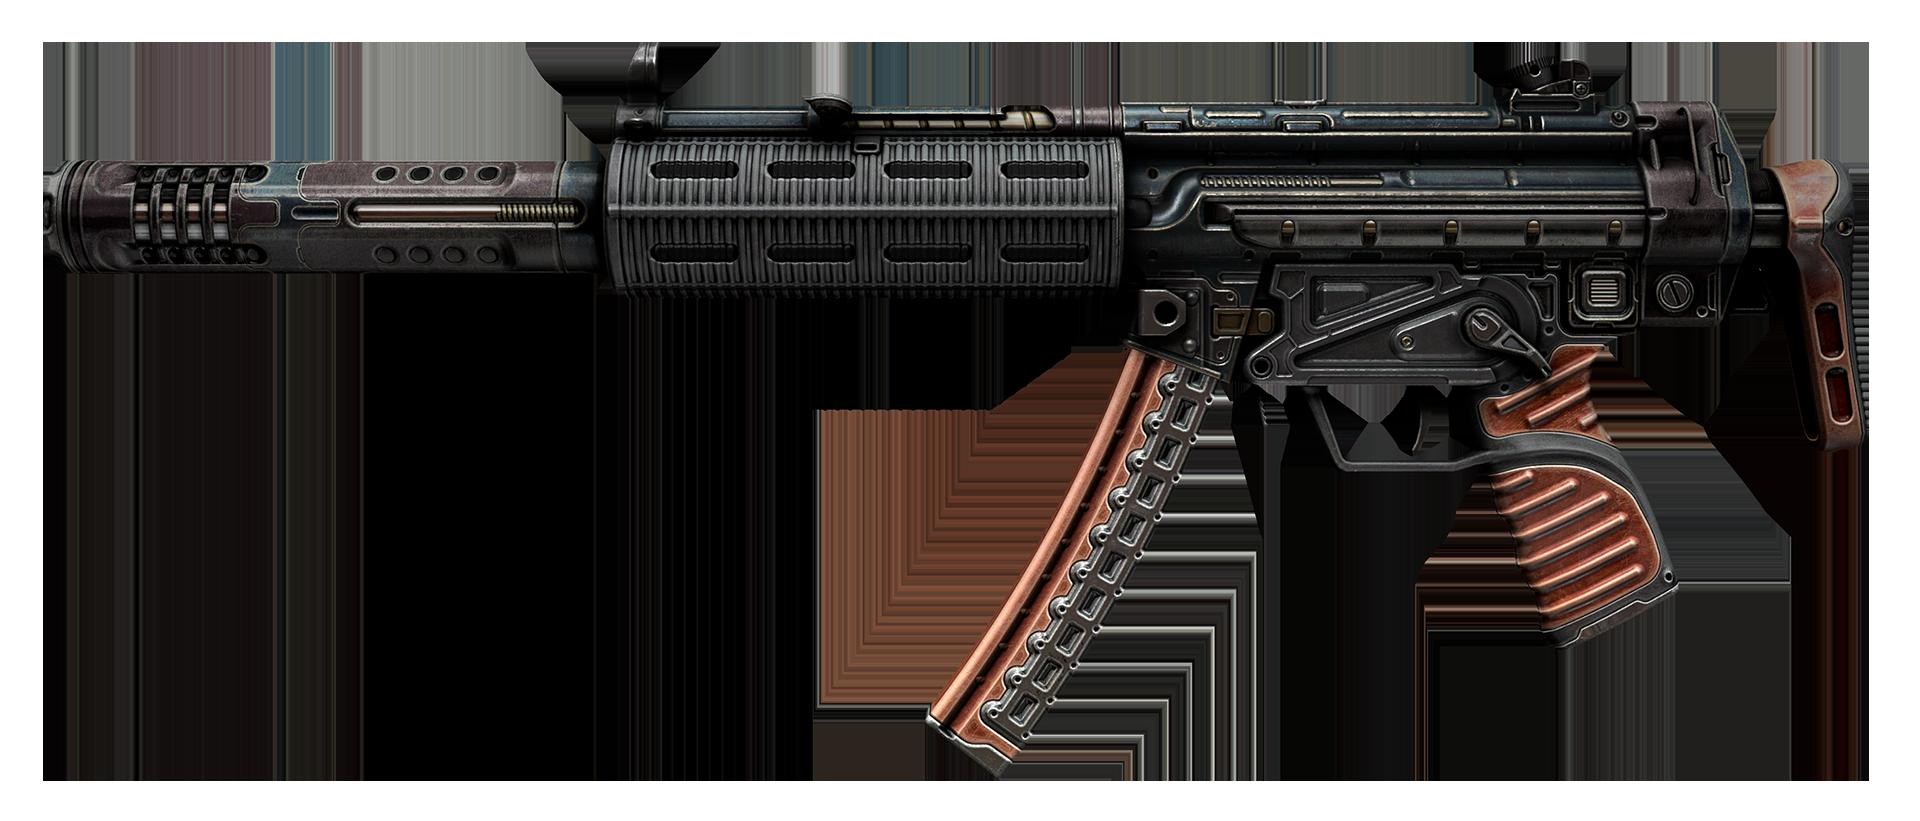 MP5-SD Gauss Large Rendering